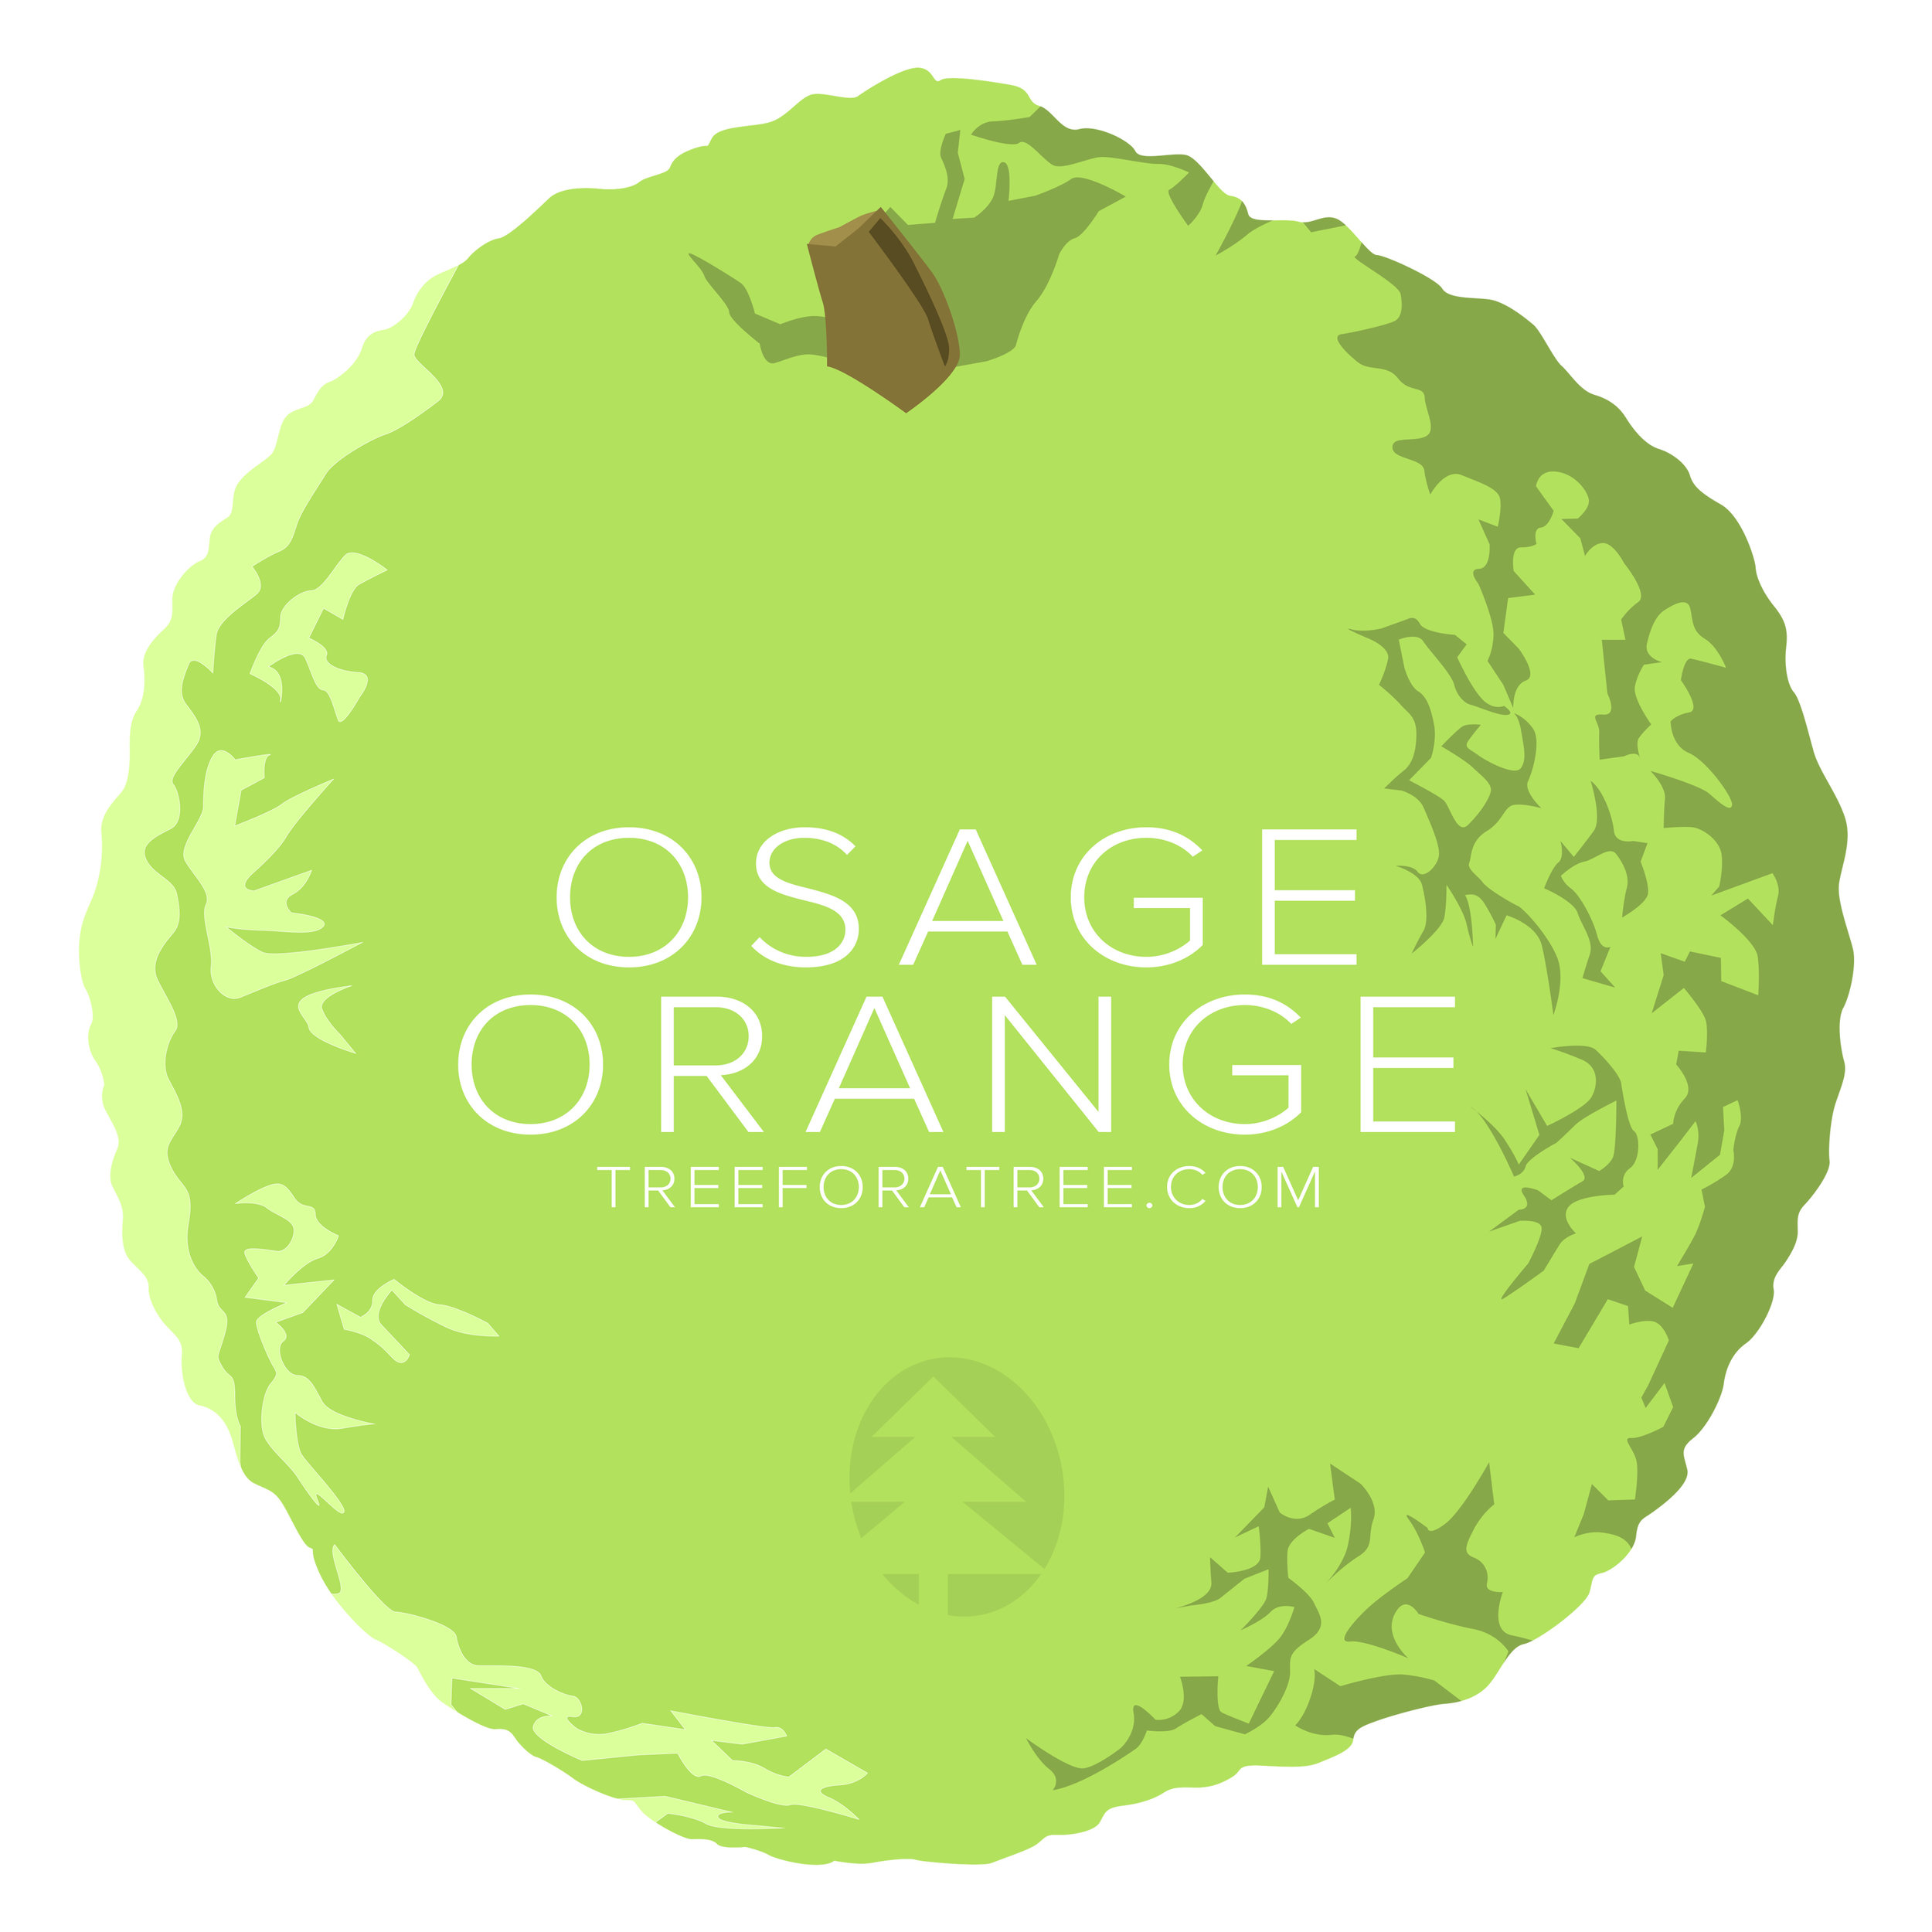 Osage Orange - Latin Name: Maclura pomiferaGrowth Rate: Very FastMature Height: ≈35 ftMature Spread: ≈35 ftState Champ: Hamilton Co. (75' high x 81' spread)